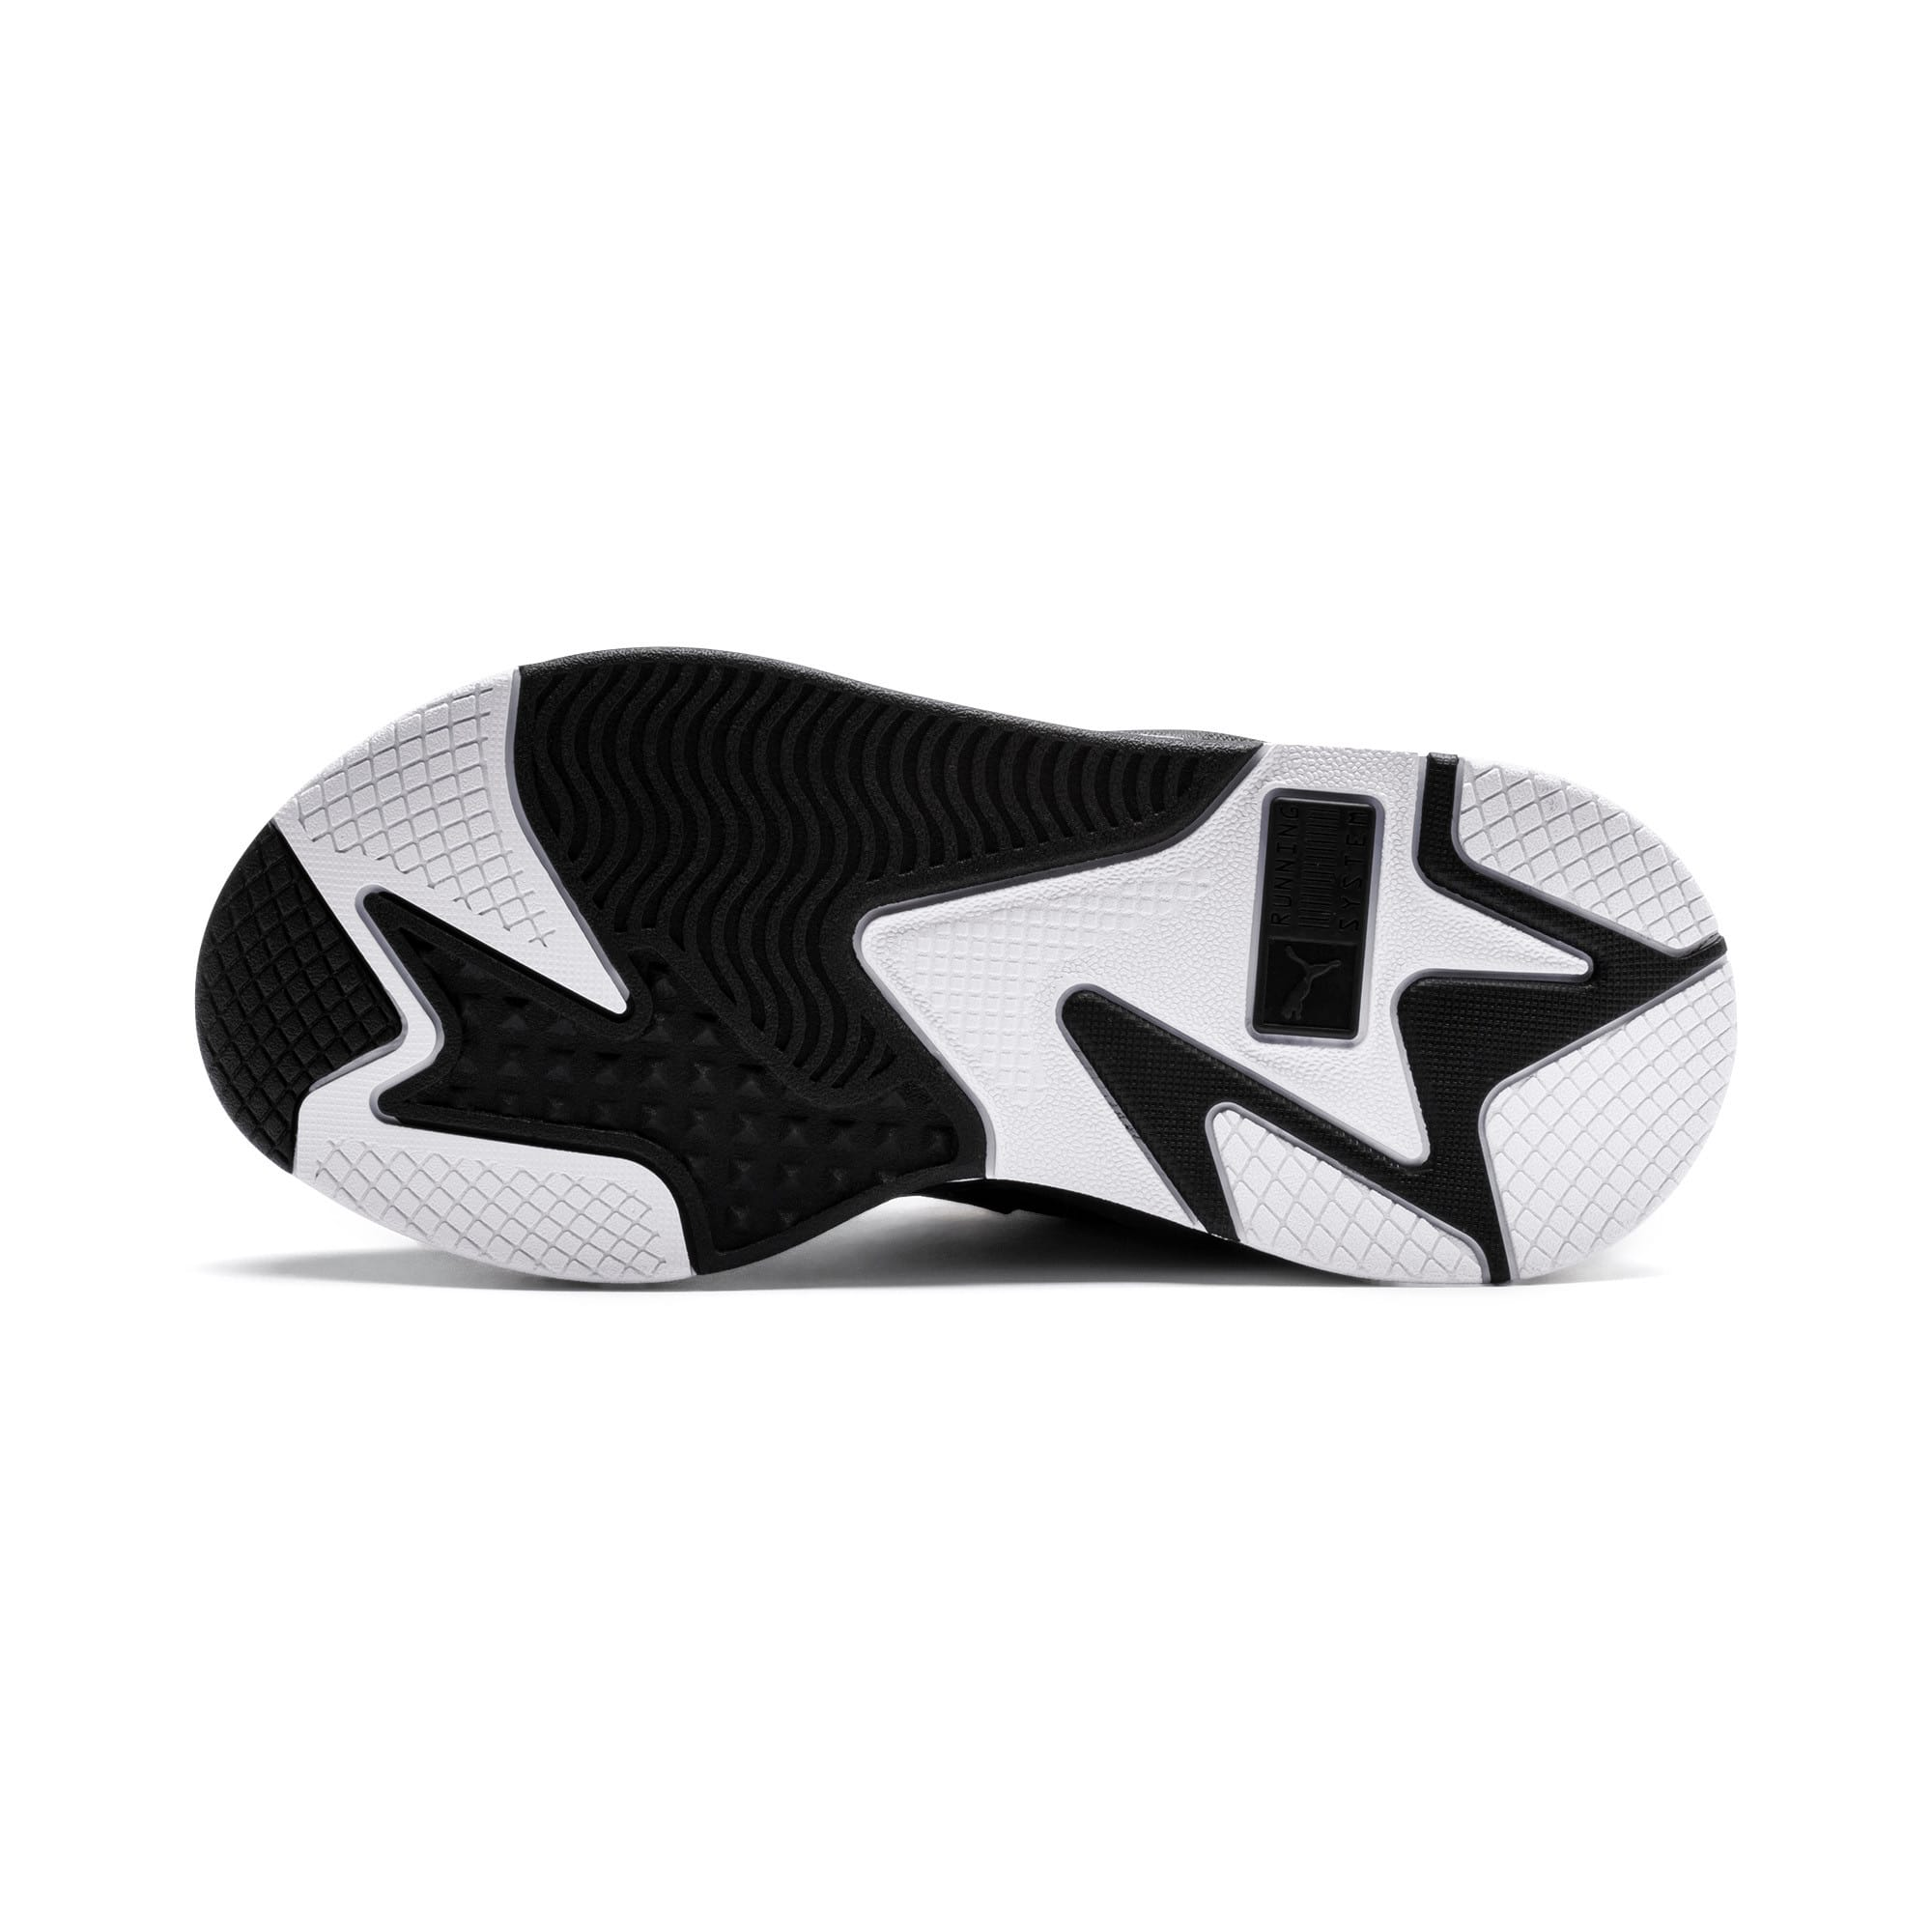 Thumbnail 4 of RS-X Trophy Sneakers JR, Puma Black-Puma Team Gold, medium